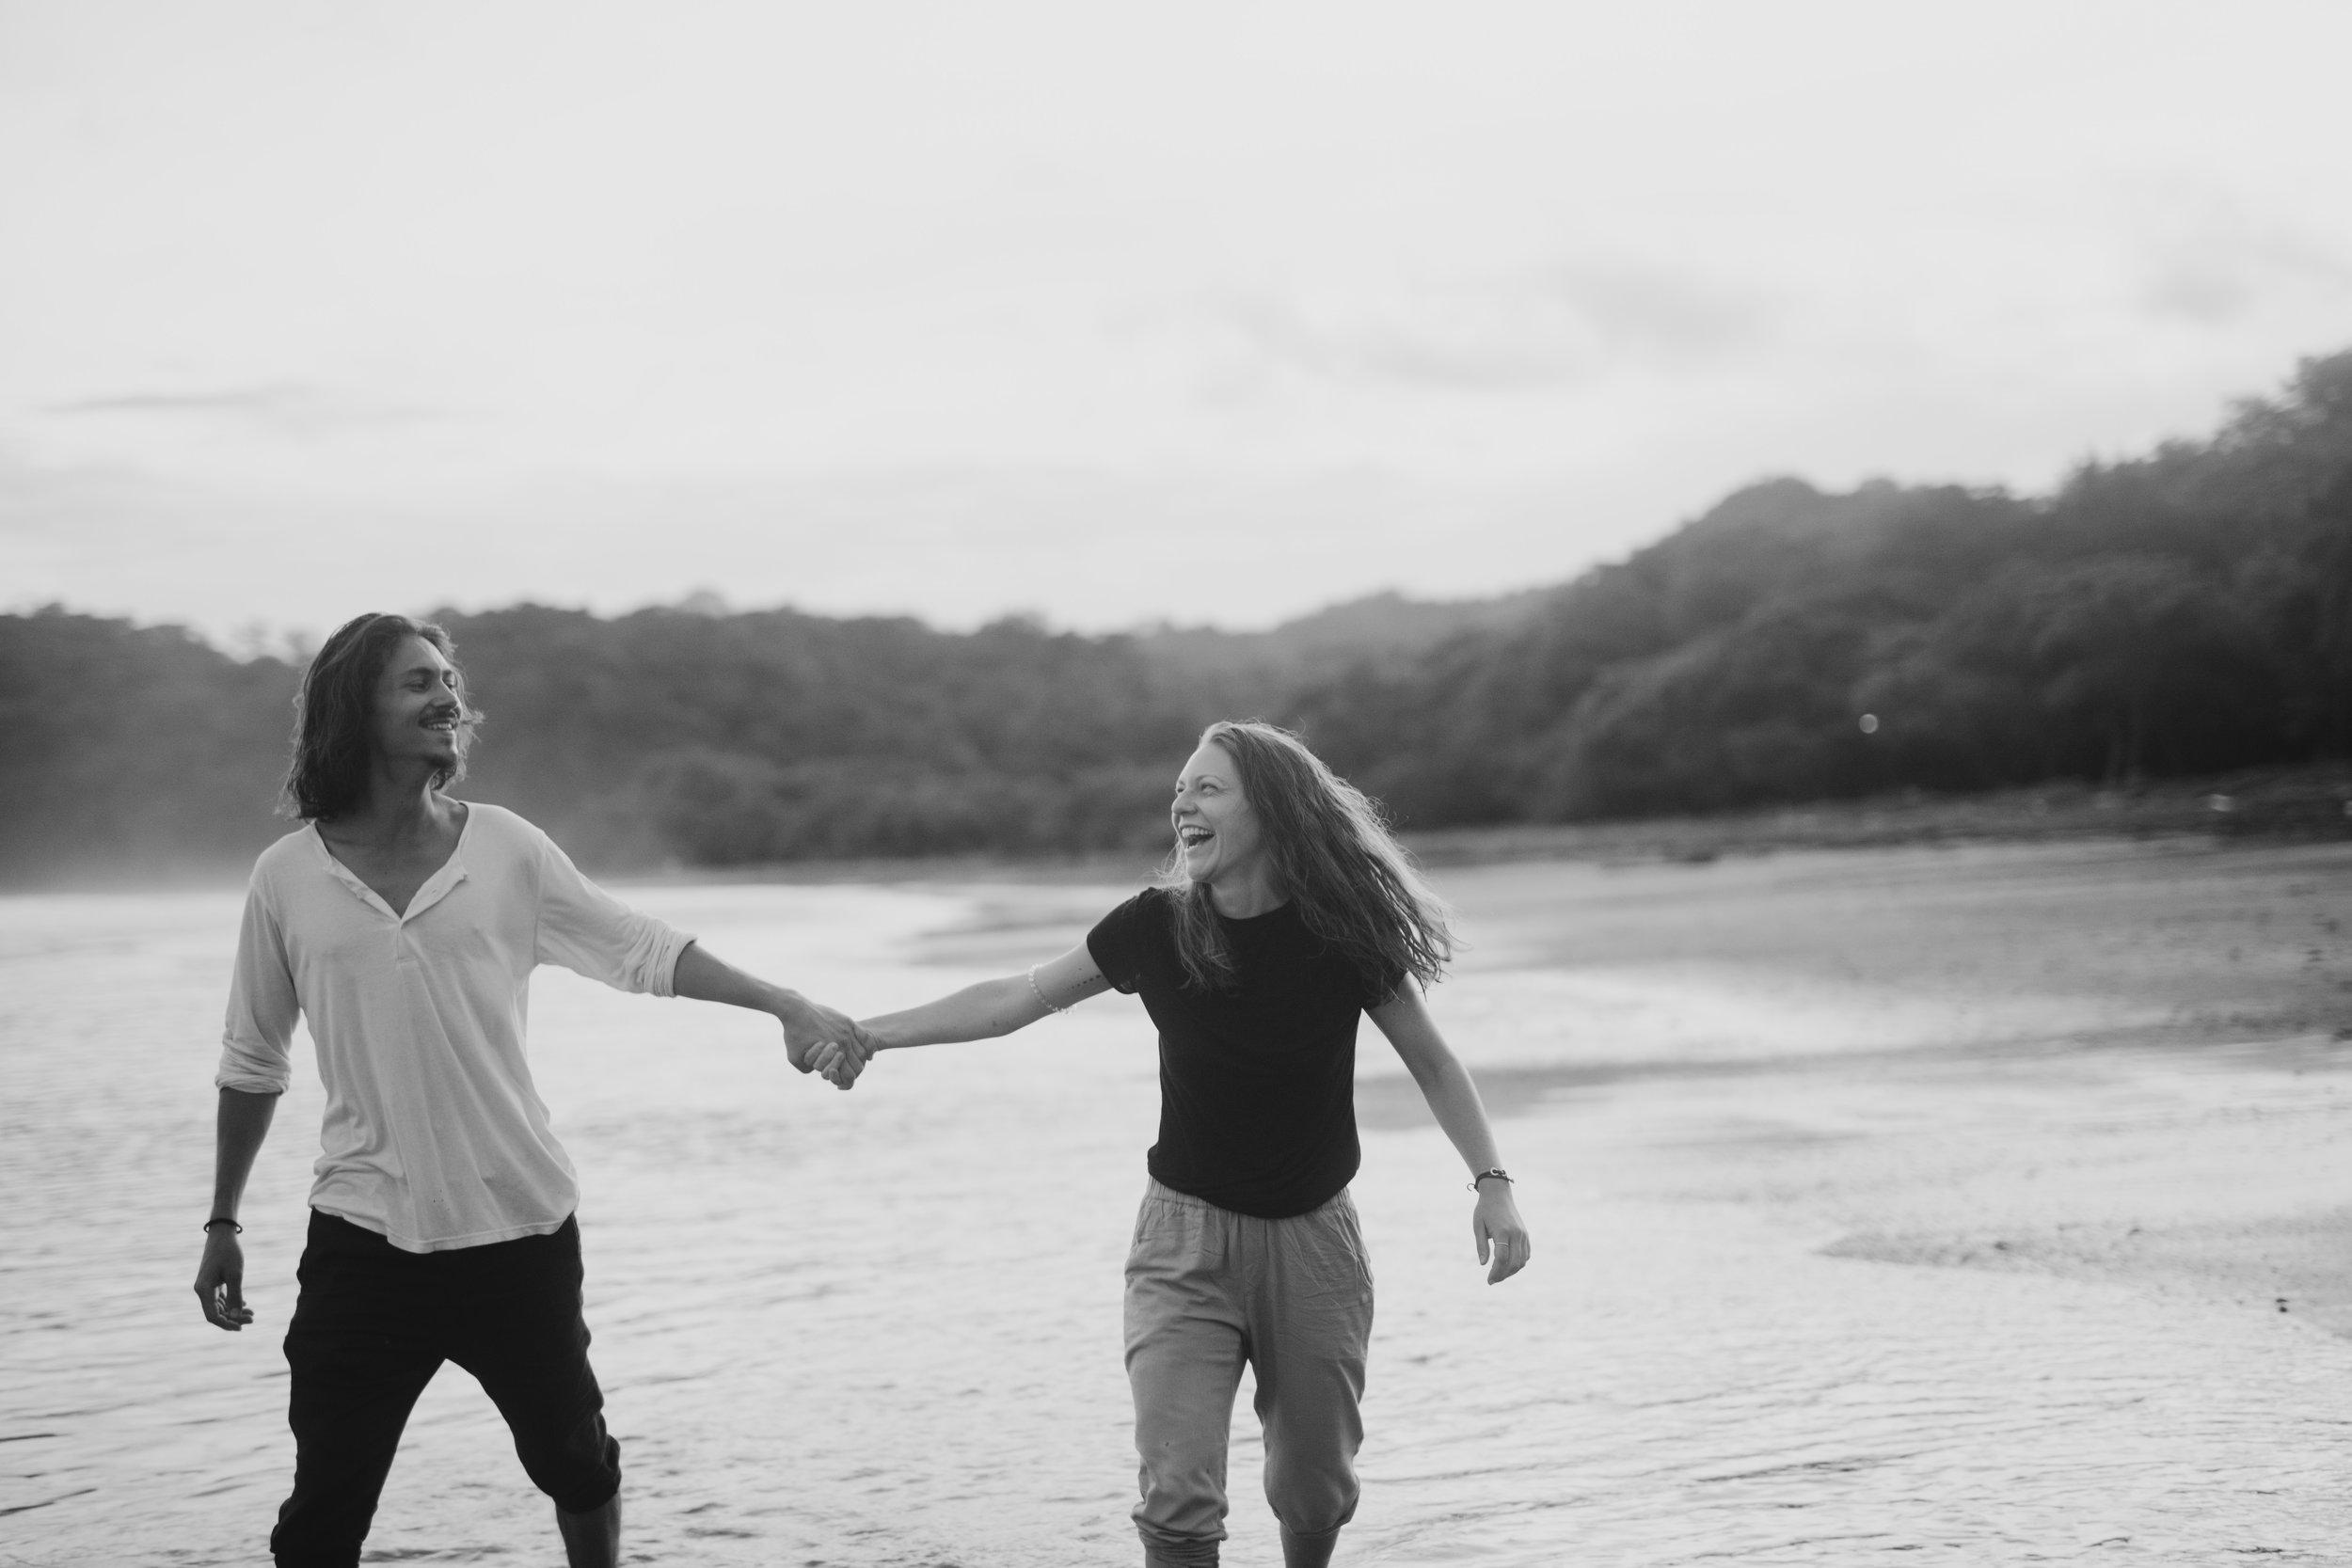 Panama Beach Engagement_Polly C Photography_20171707183404.jpg